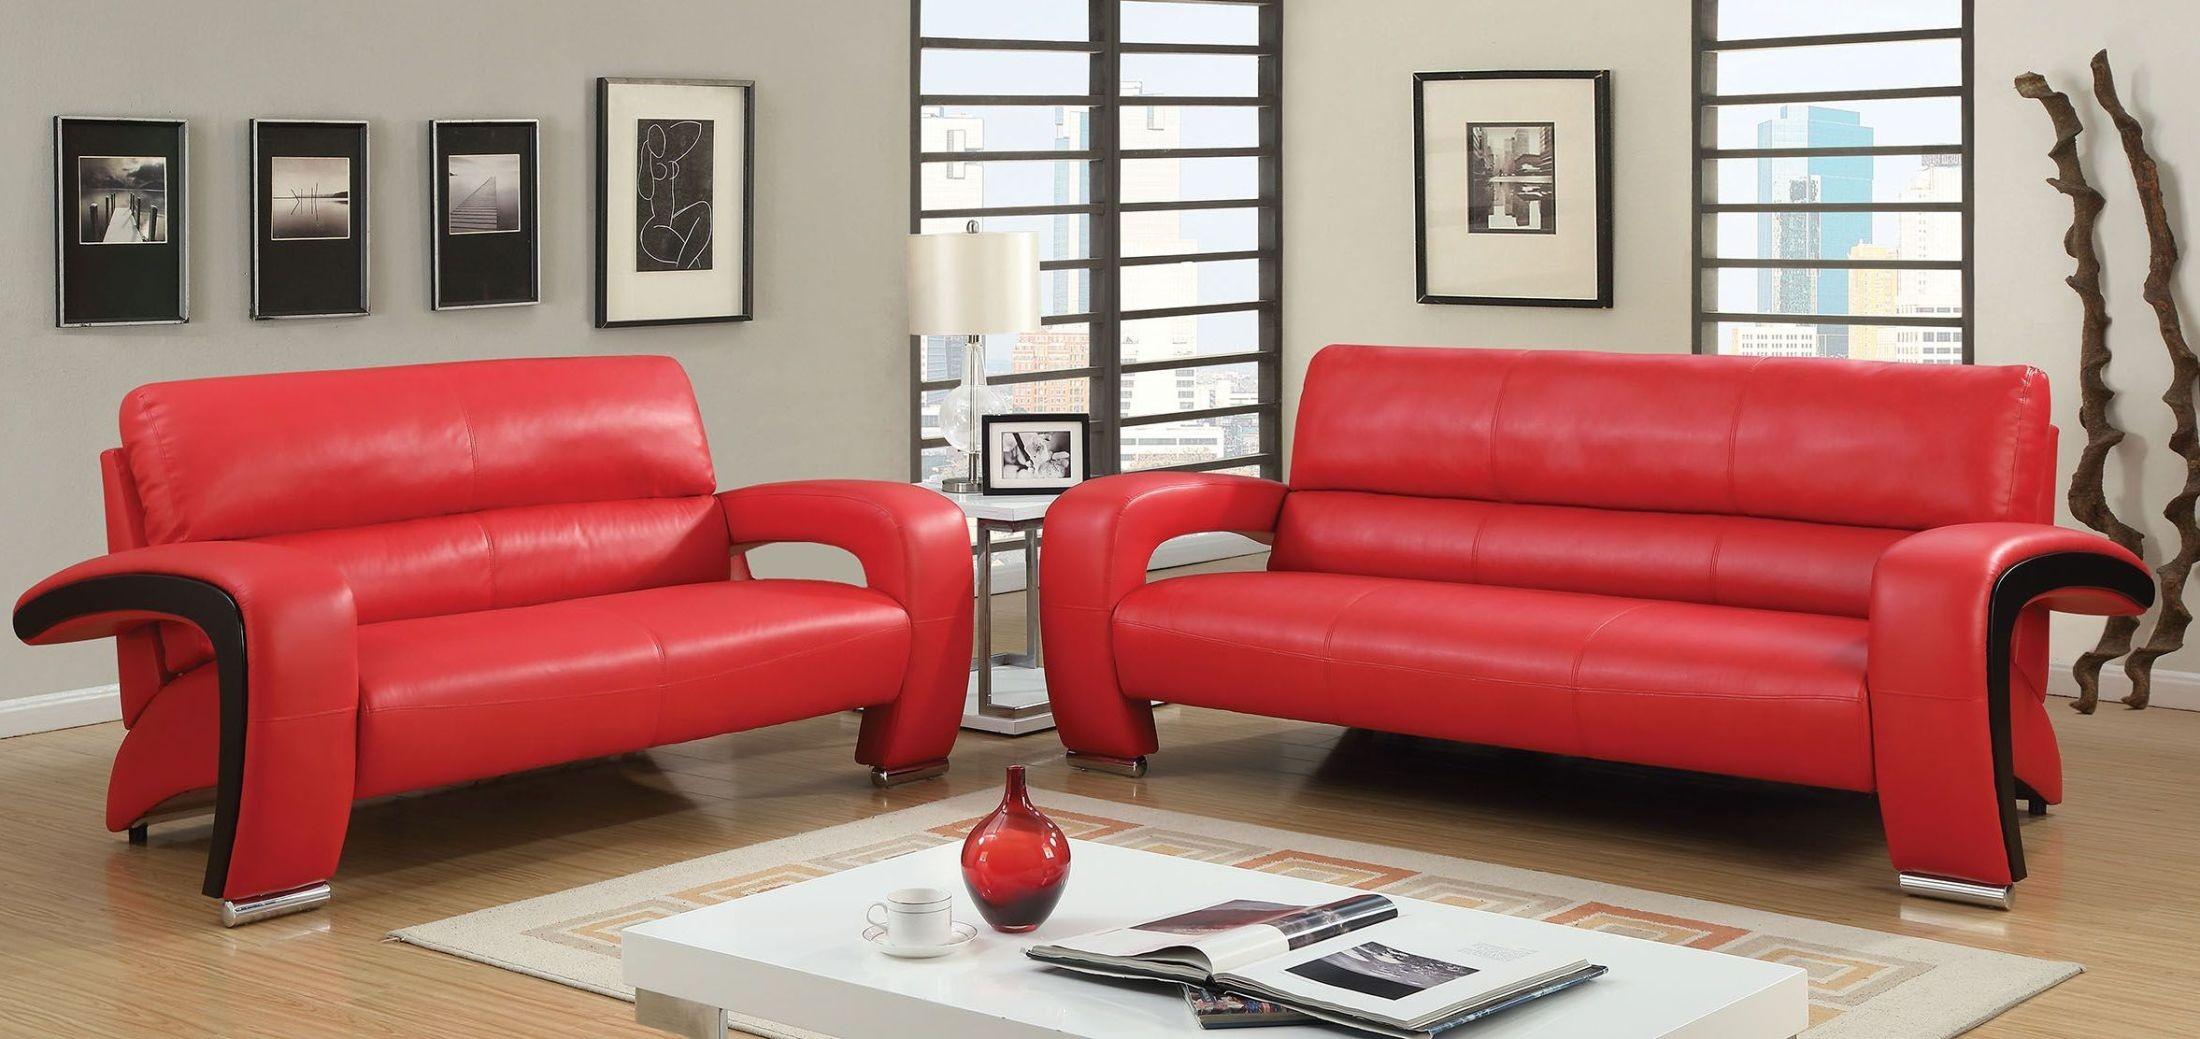 Wezen Red Living Room Set From Furniture Of America Coleman Furniture